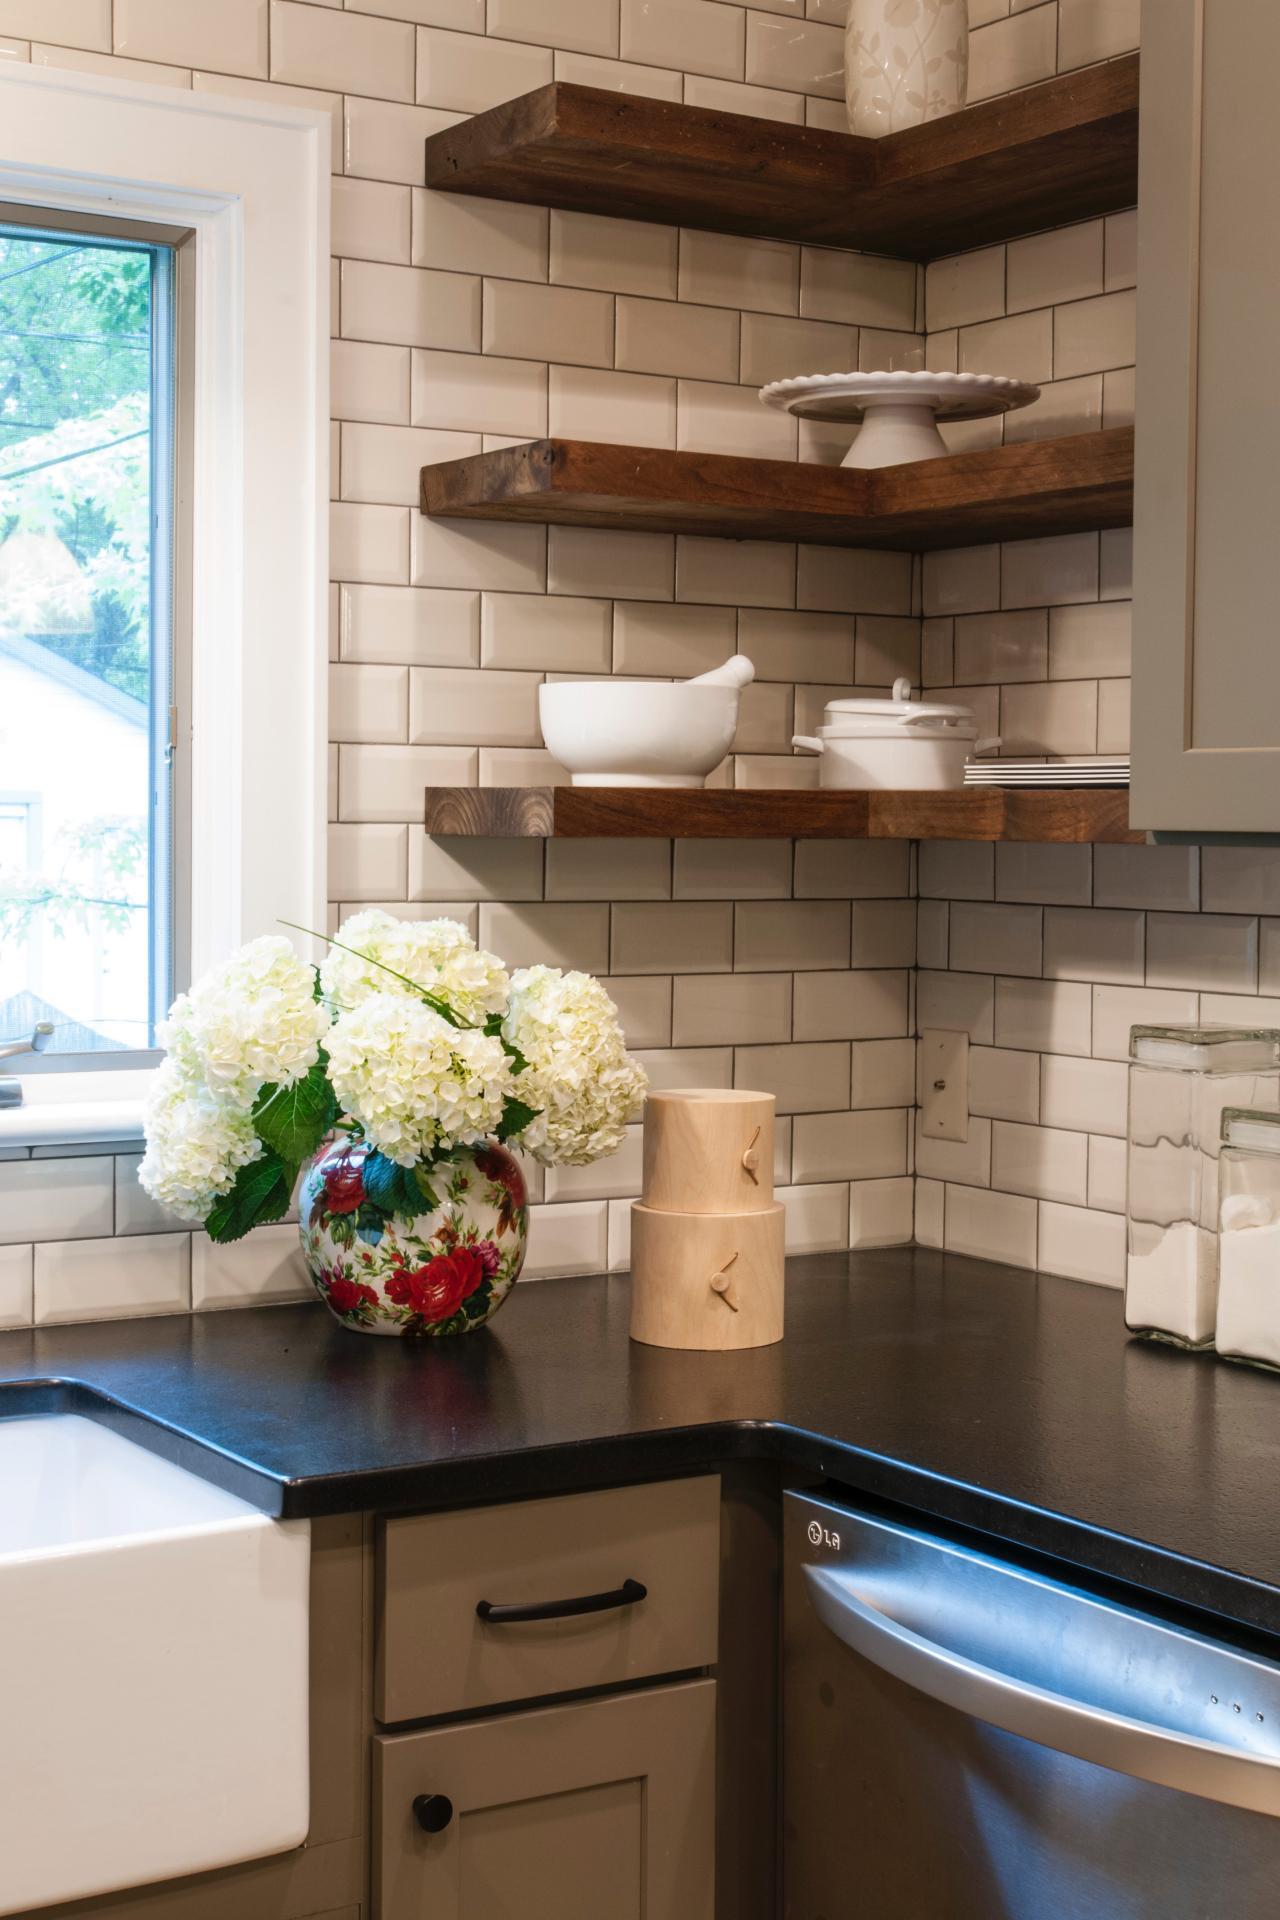 Black Kitchen Countertop And White Subway Tile Backsplash